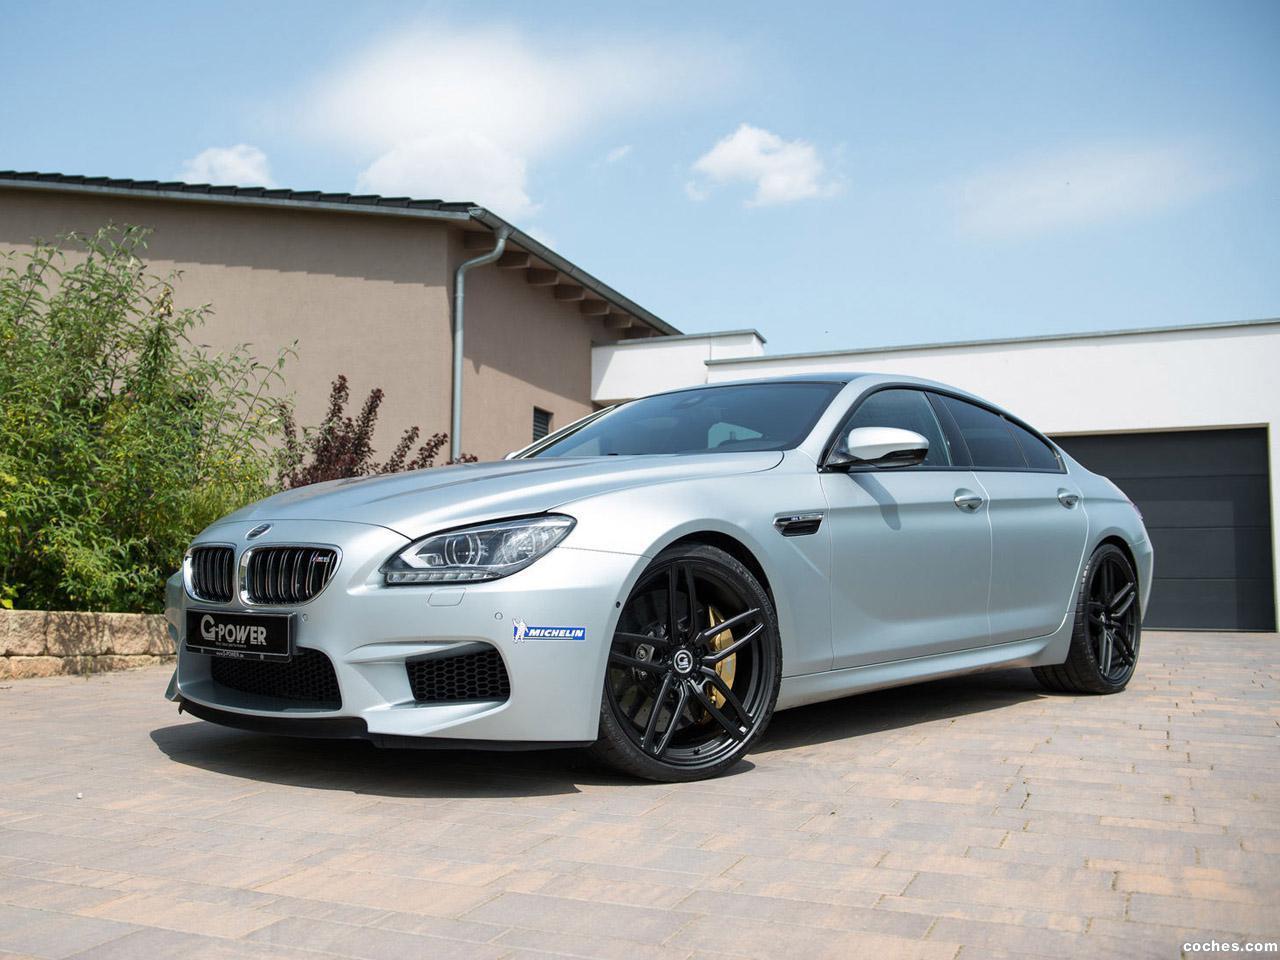 Foto 0 de BMW G-Power Serie 6 M6 Gran Coupe 2014